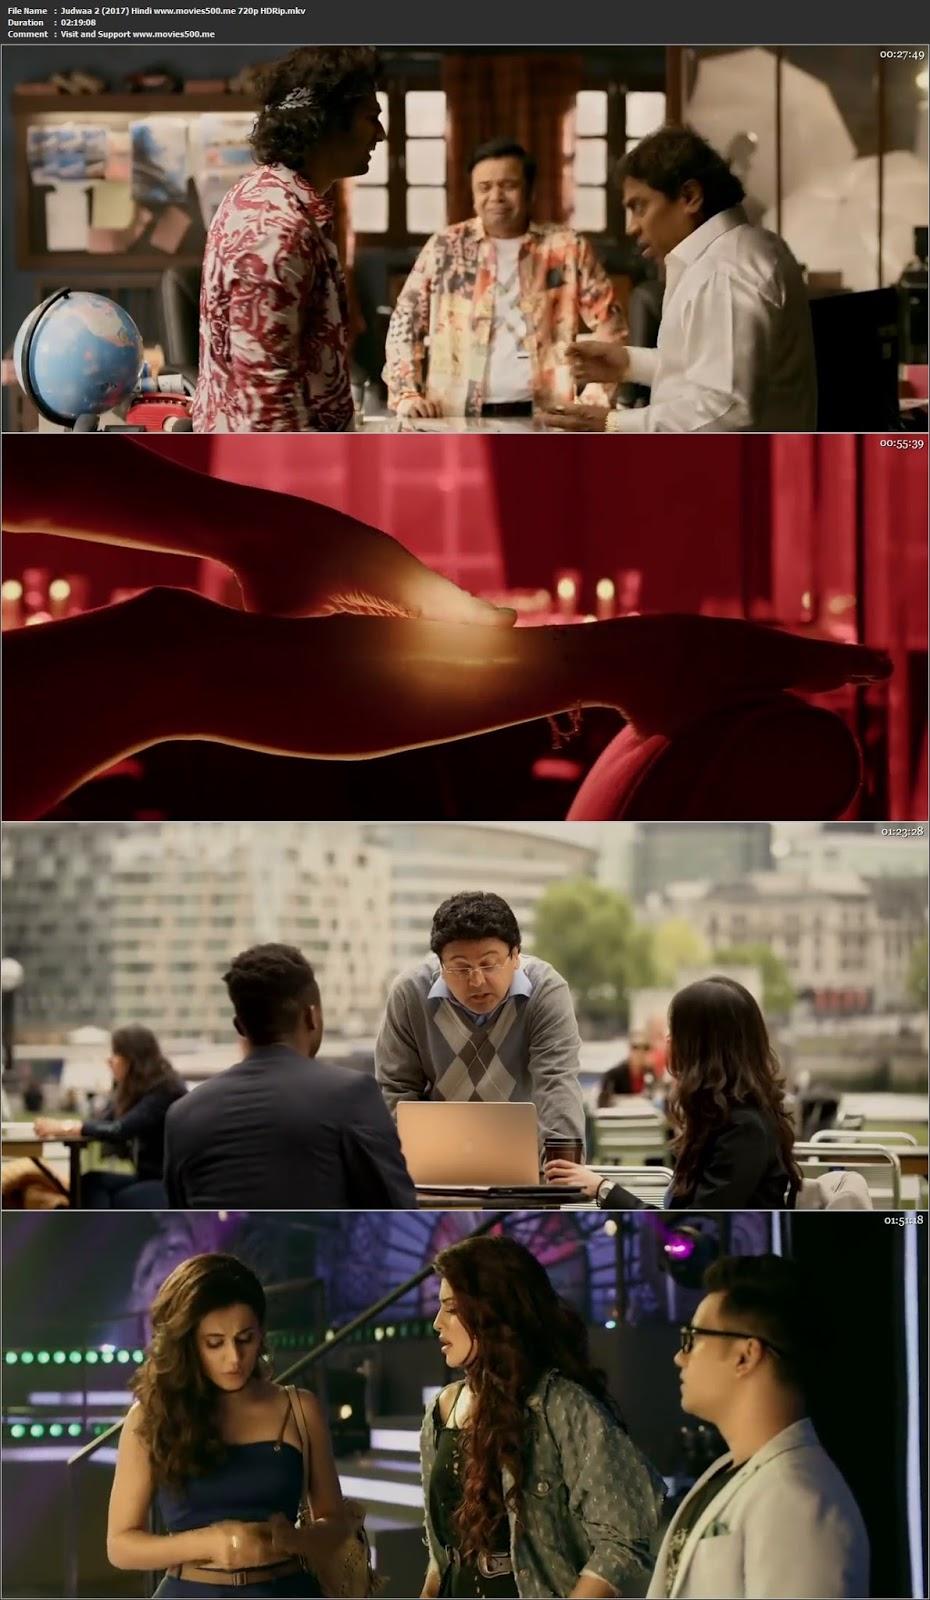 Judwaa 2 2017 Hindi Full Movie HDRip 720p 1GB at movies500.site